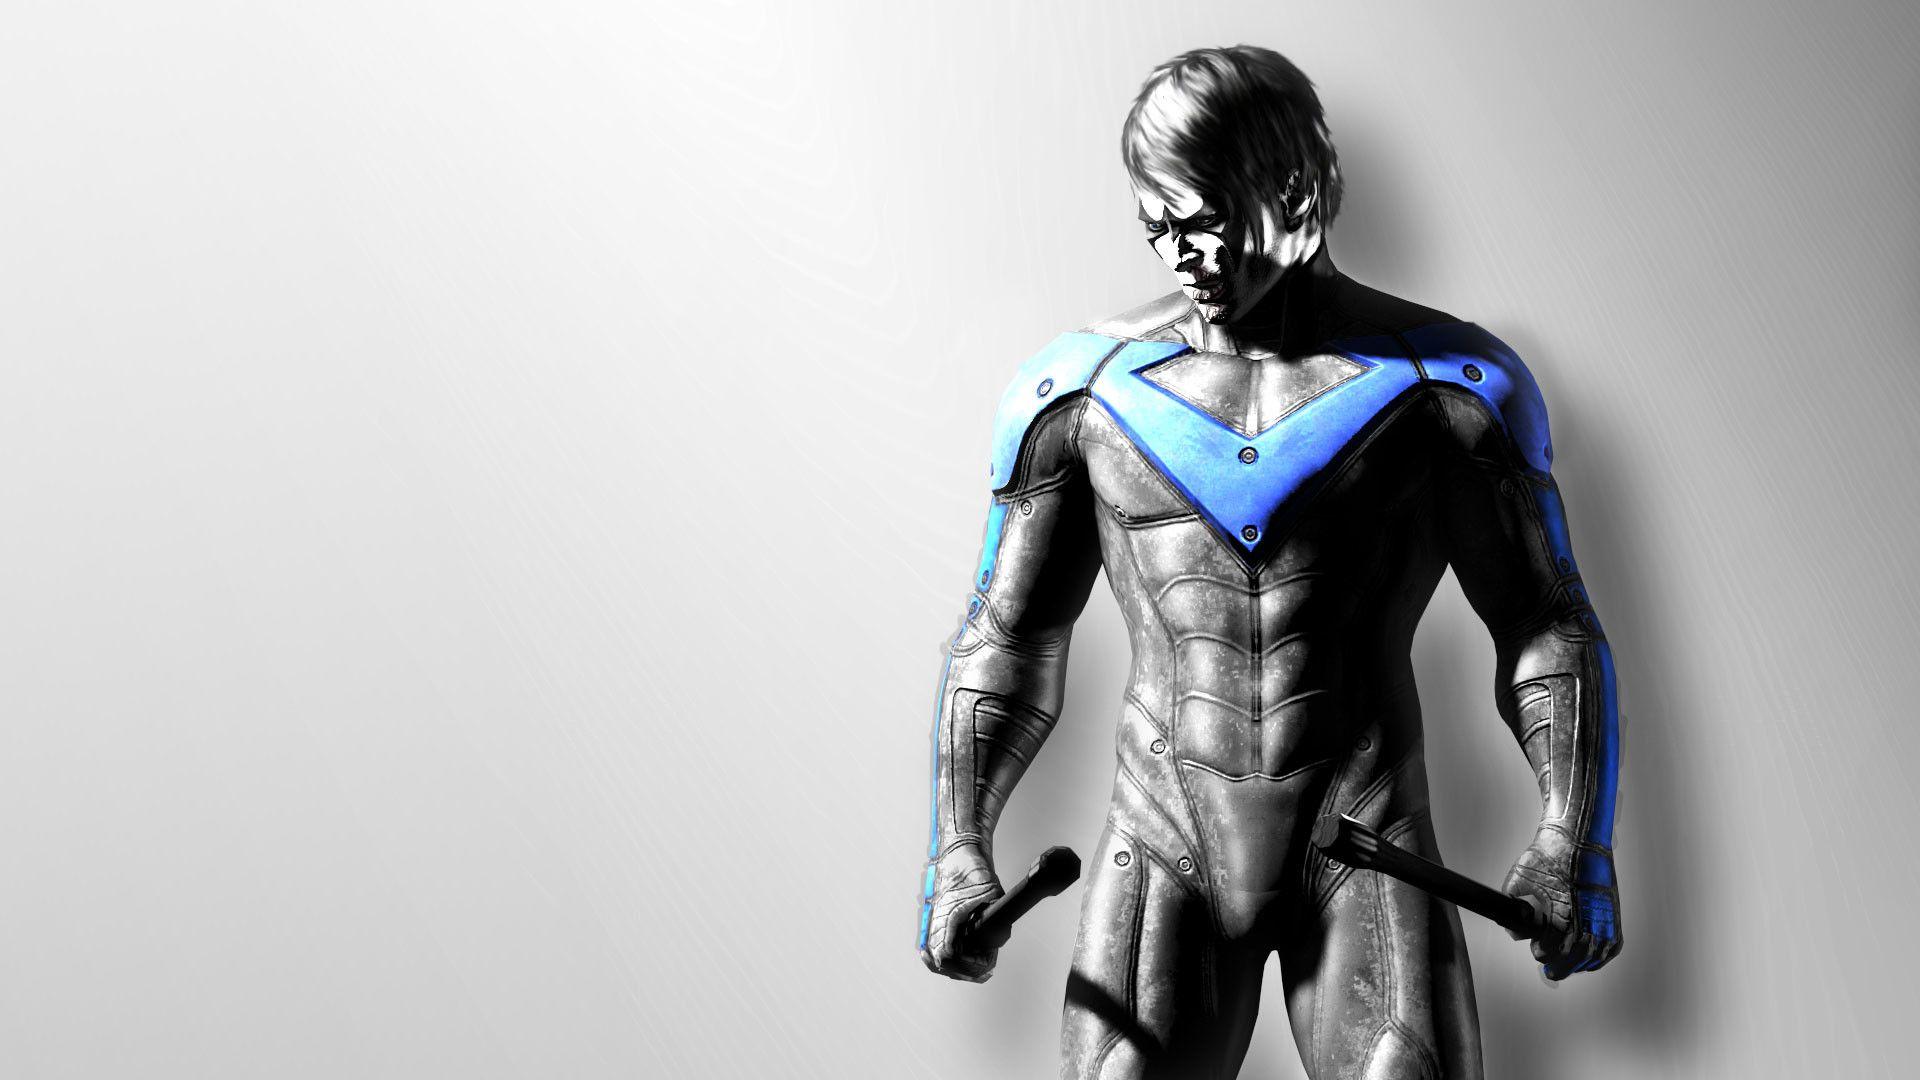 1920x1080 Batman Arkham City Nightwing 1920x1080 Wallpaper